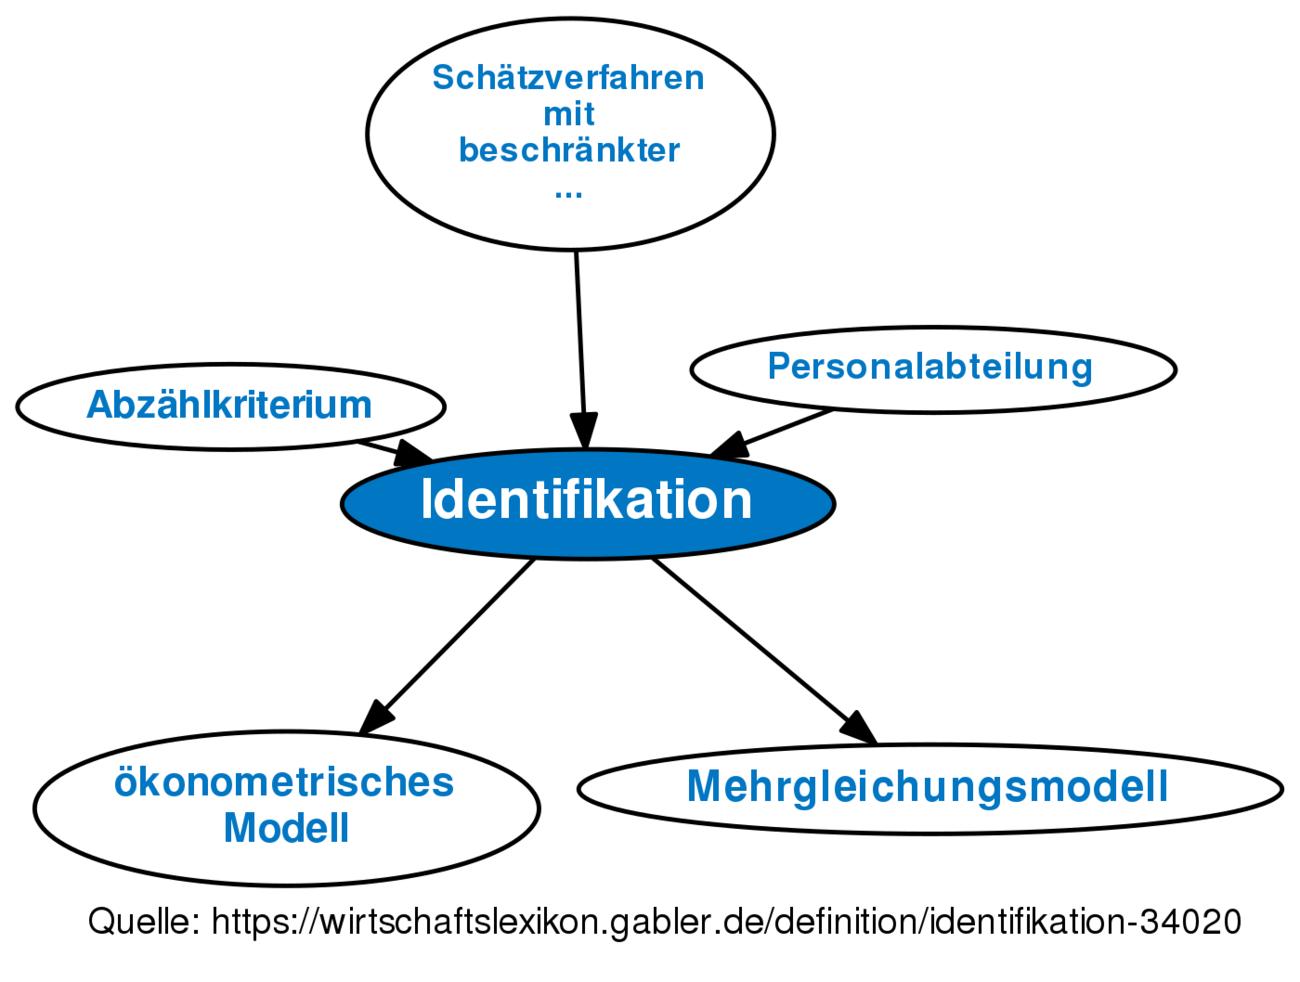 Indentifikation